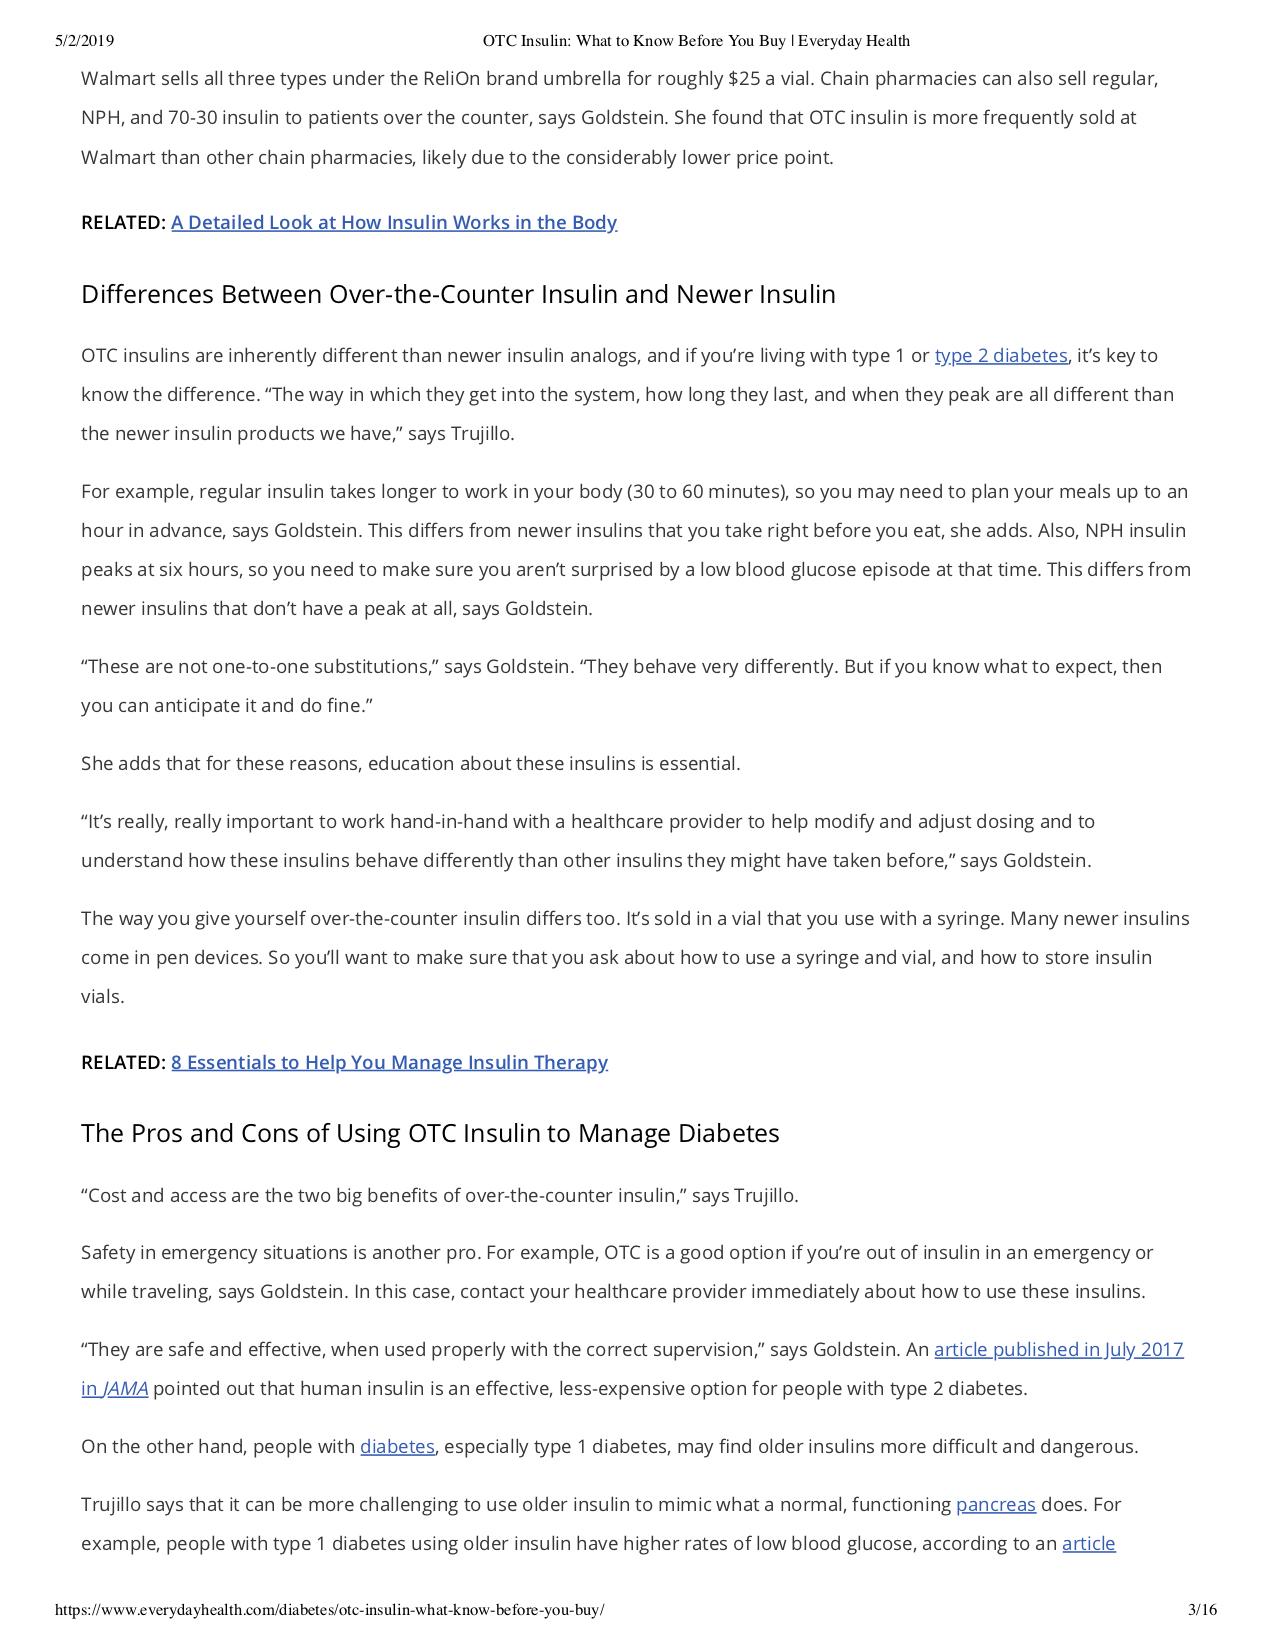 Everydayhealth.com   Page 3/4  April 2018